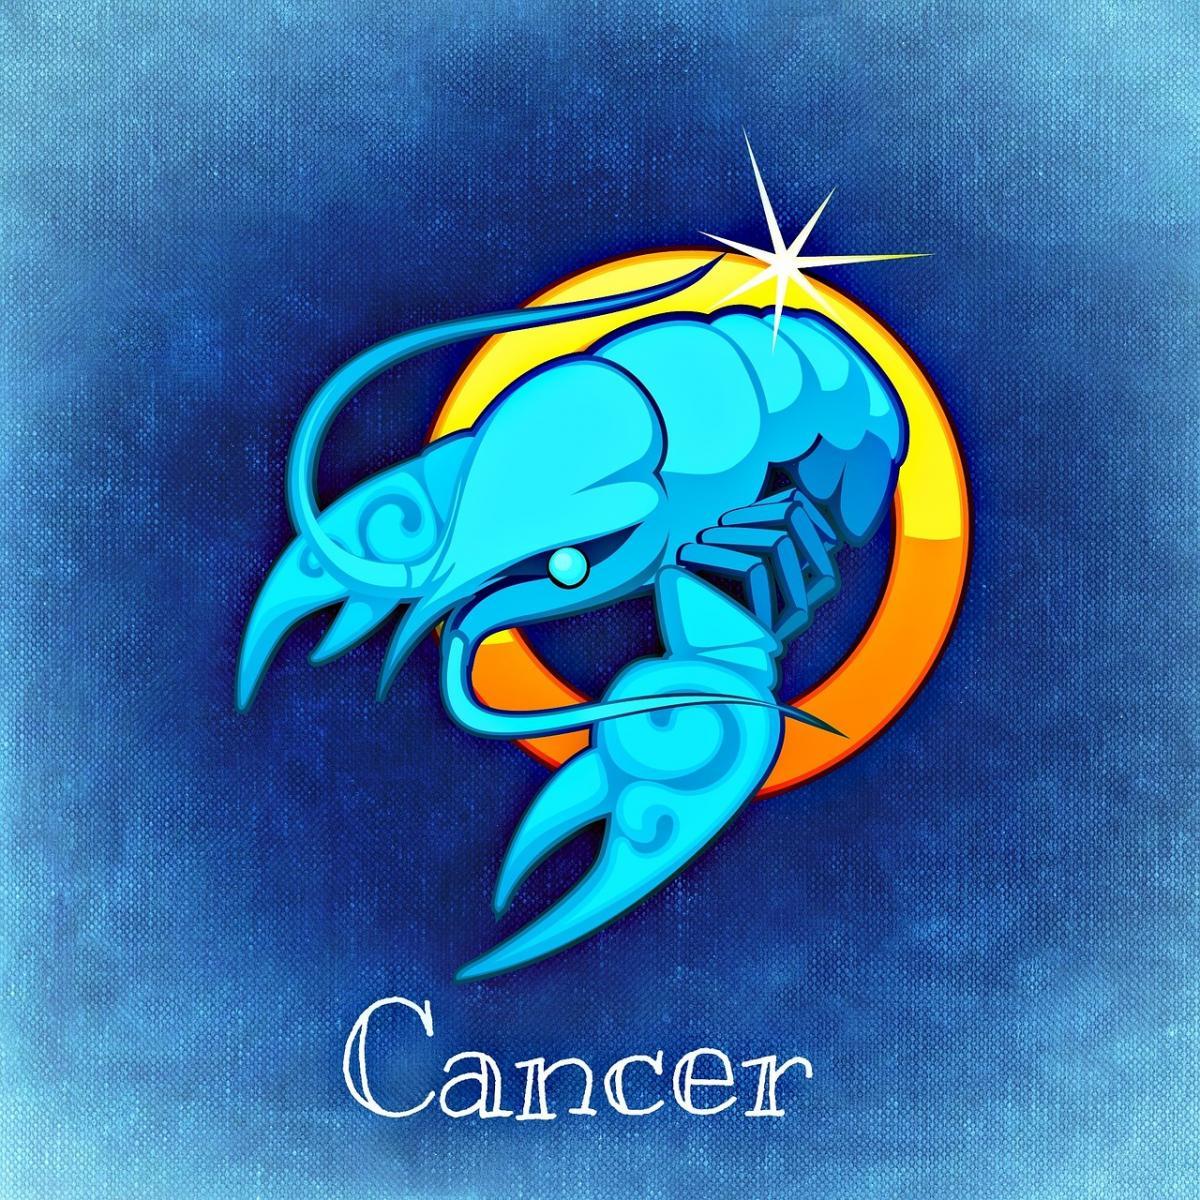 cancer-759378_1280